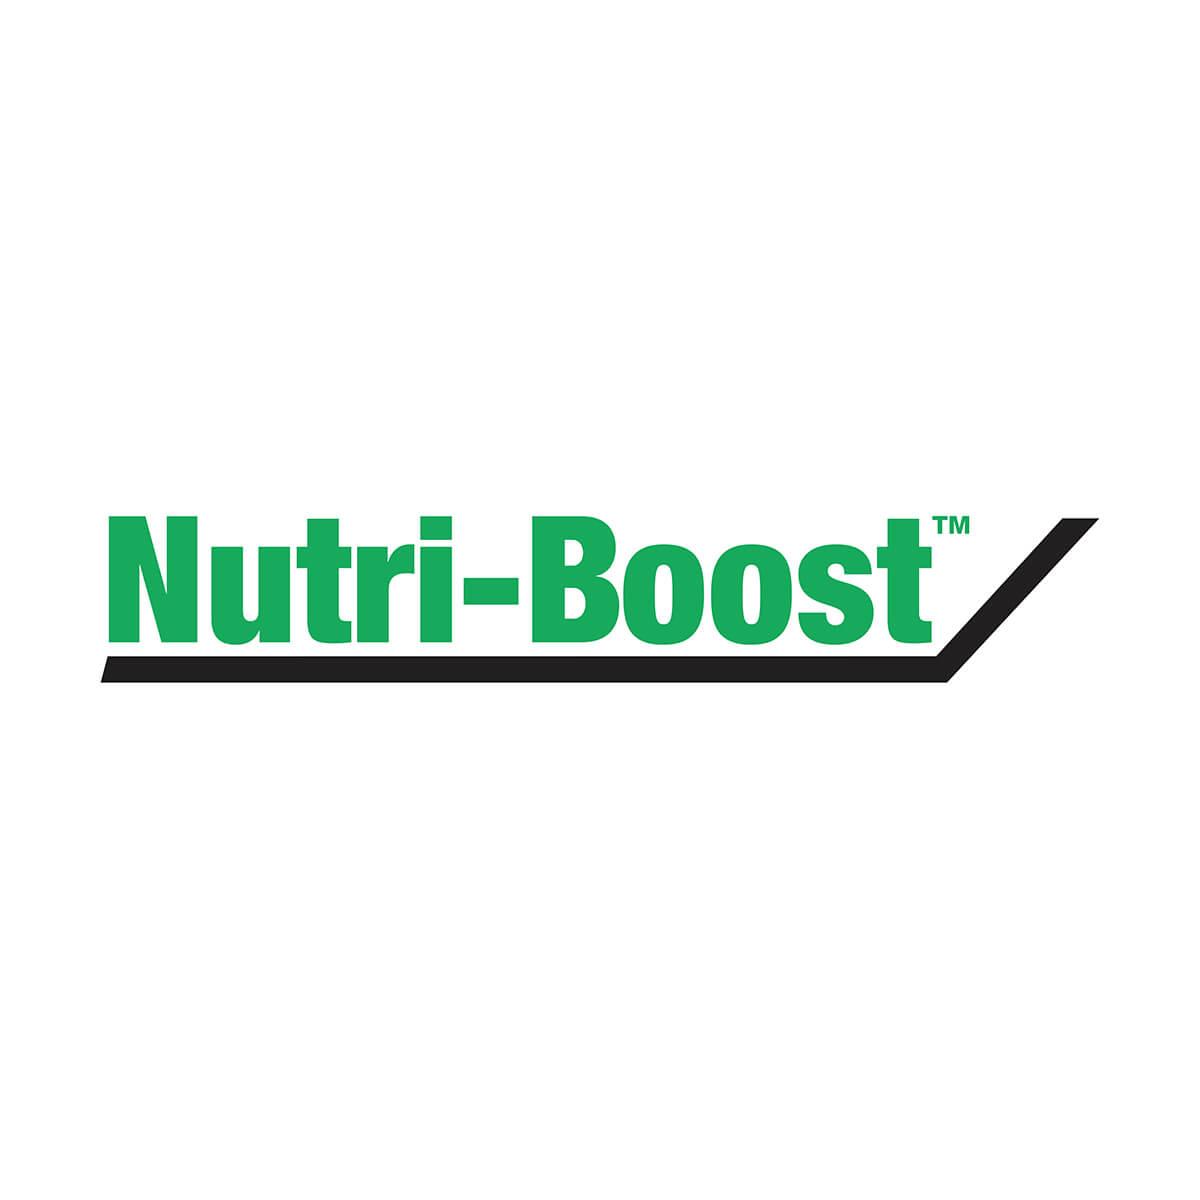 Nutriboost - 1000L Tote